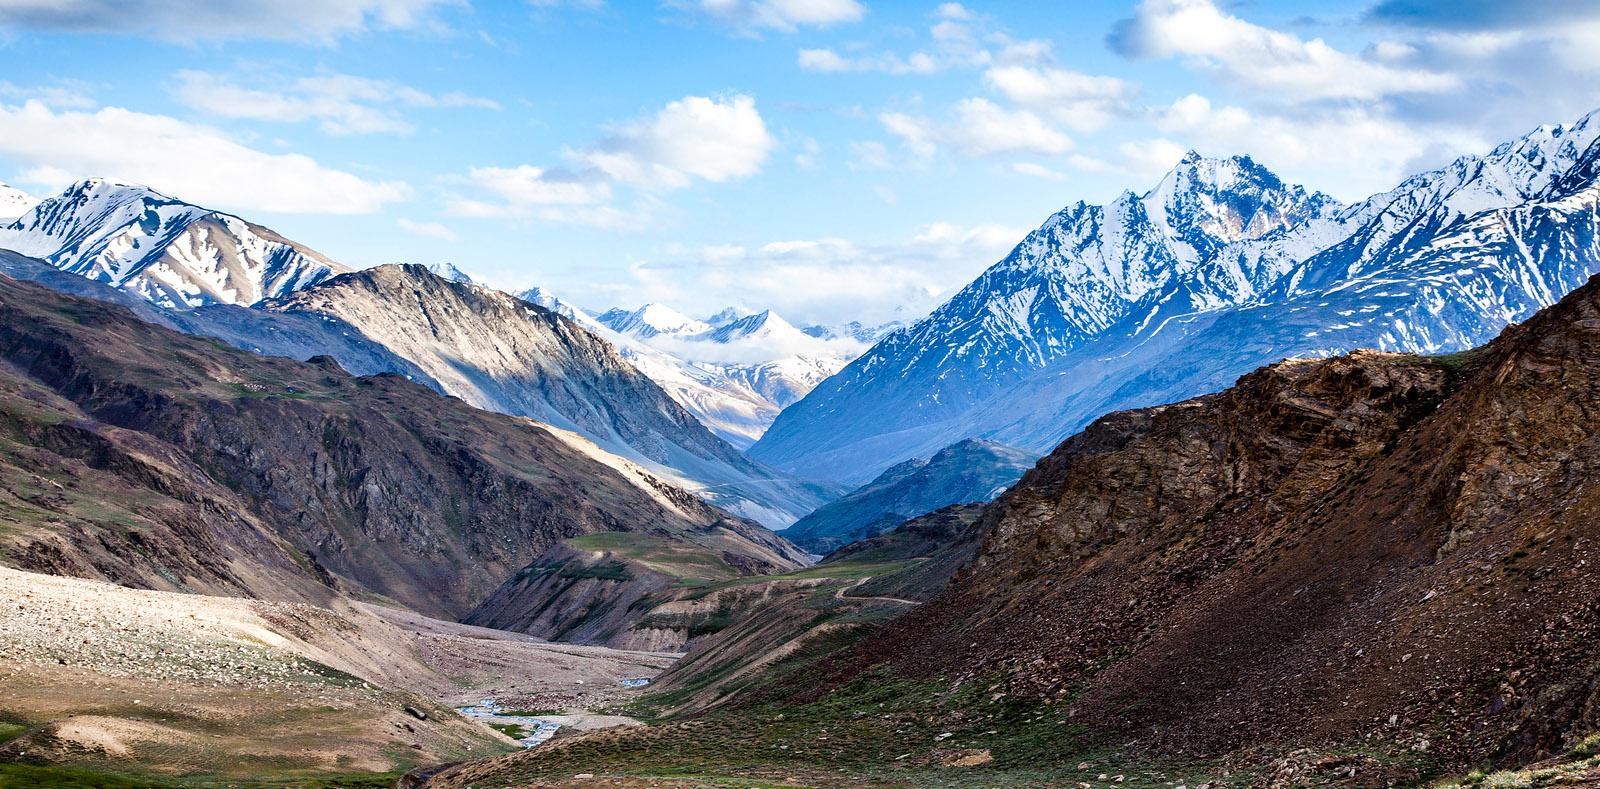 Annapurna Massif, Nepal, 18 Day Guided Hiking Tour